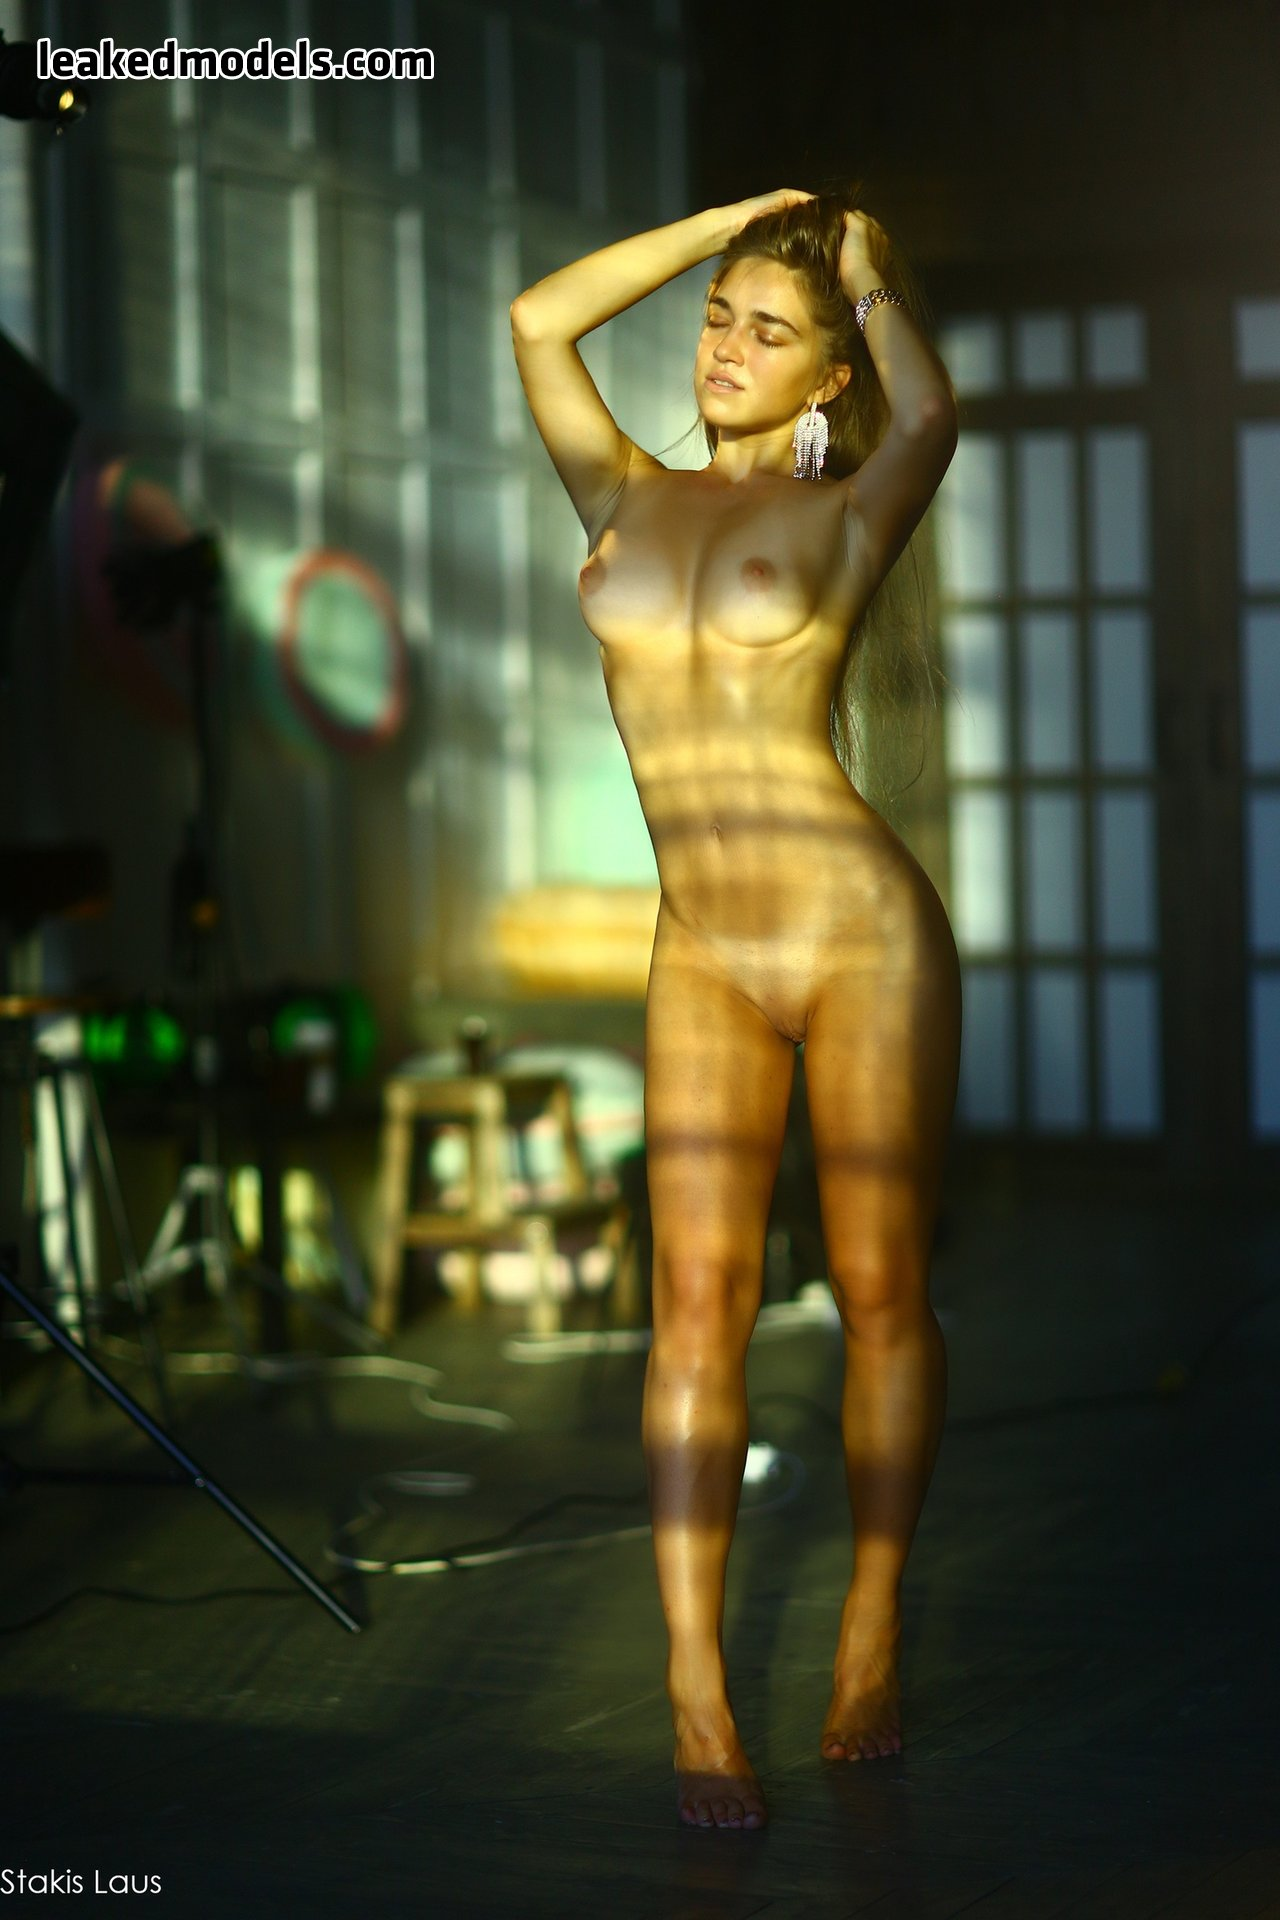 Nastya Komarova – artistnastya OnlyFans Nude Leaks (16 Photos)